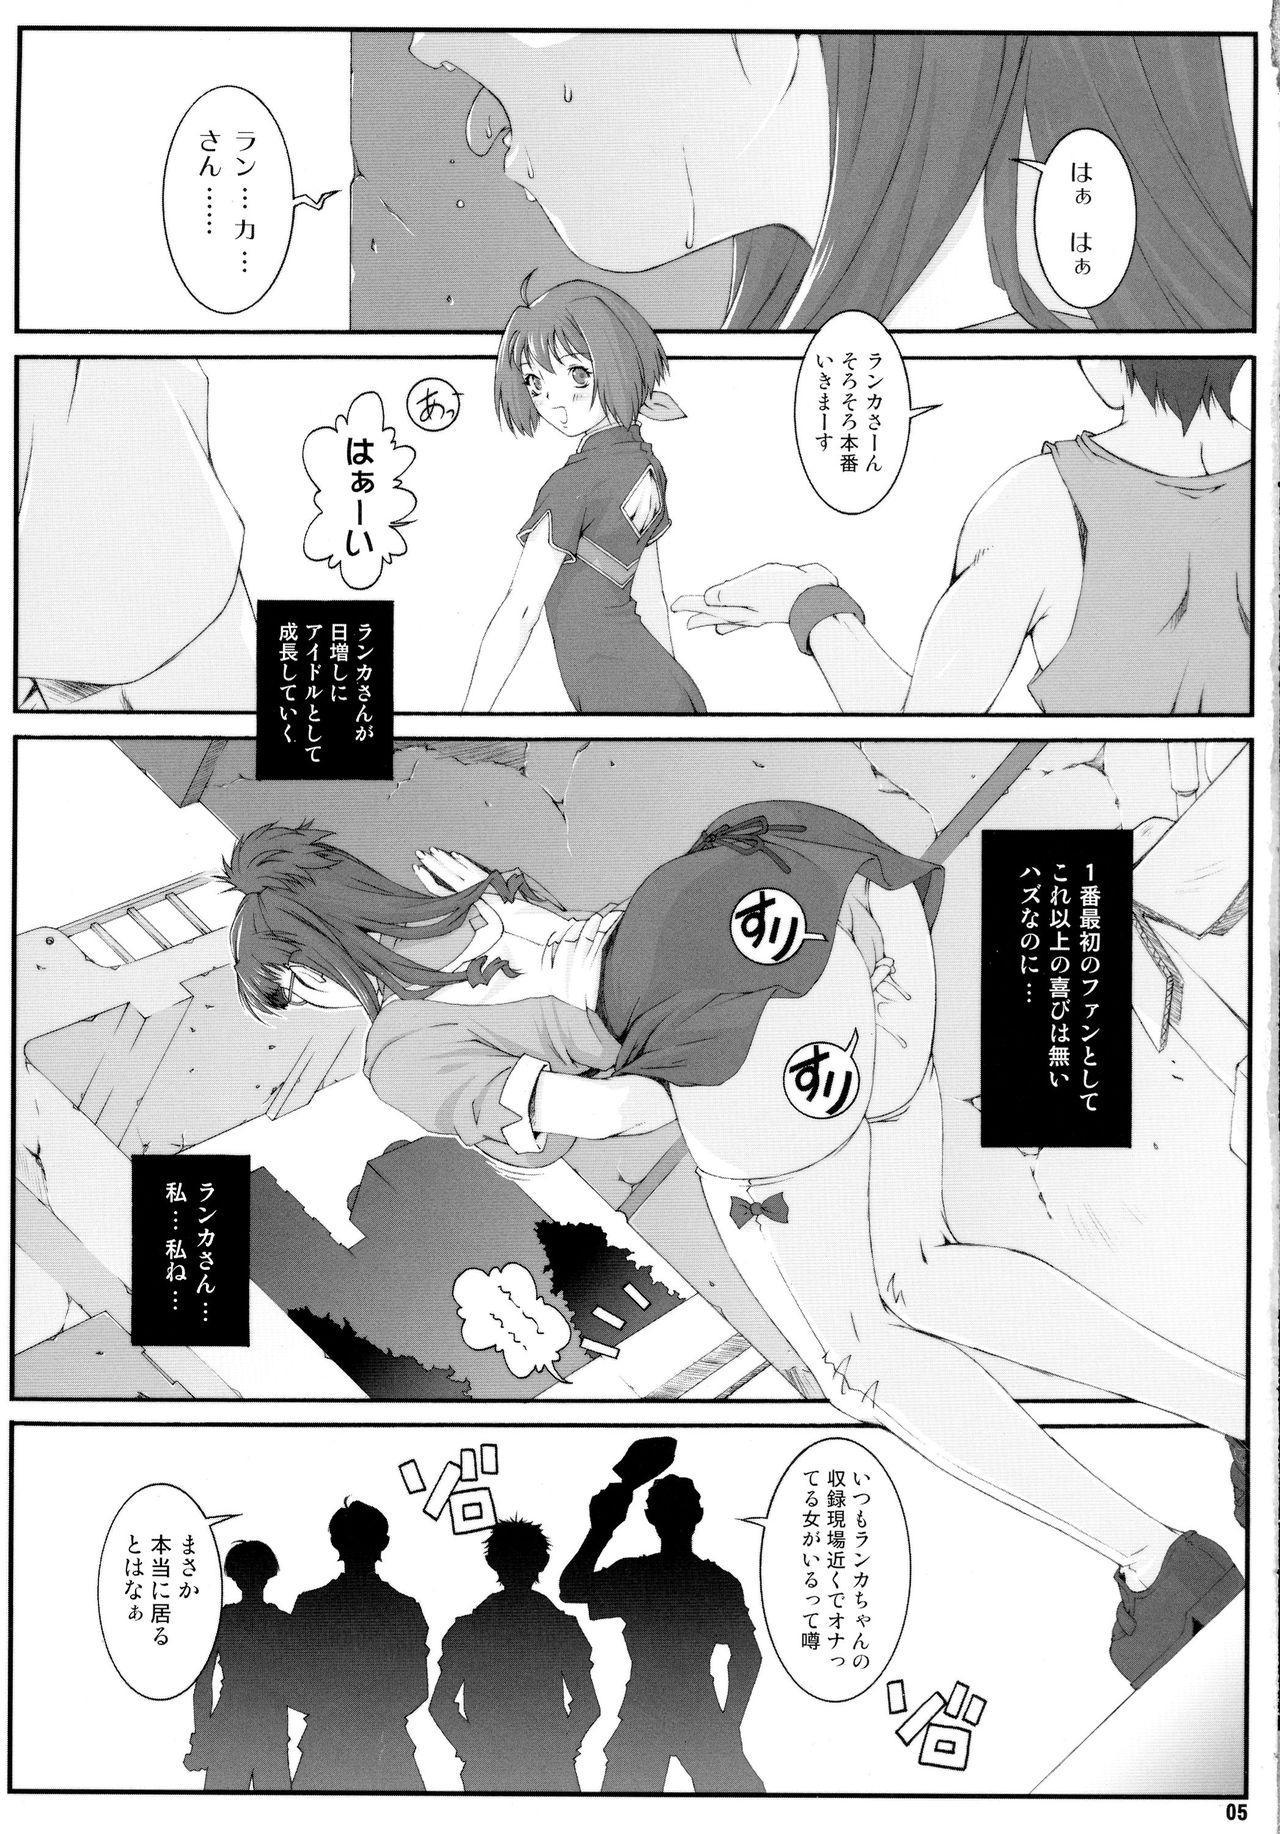 Misoka no 5 4